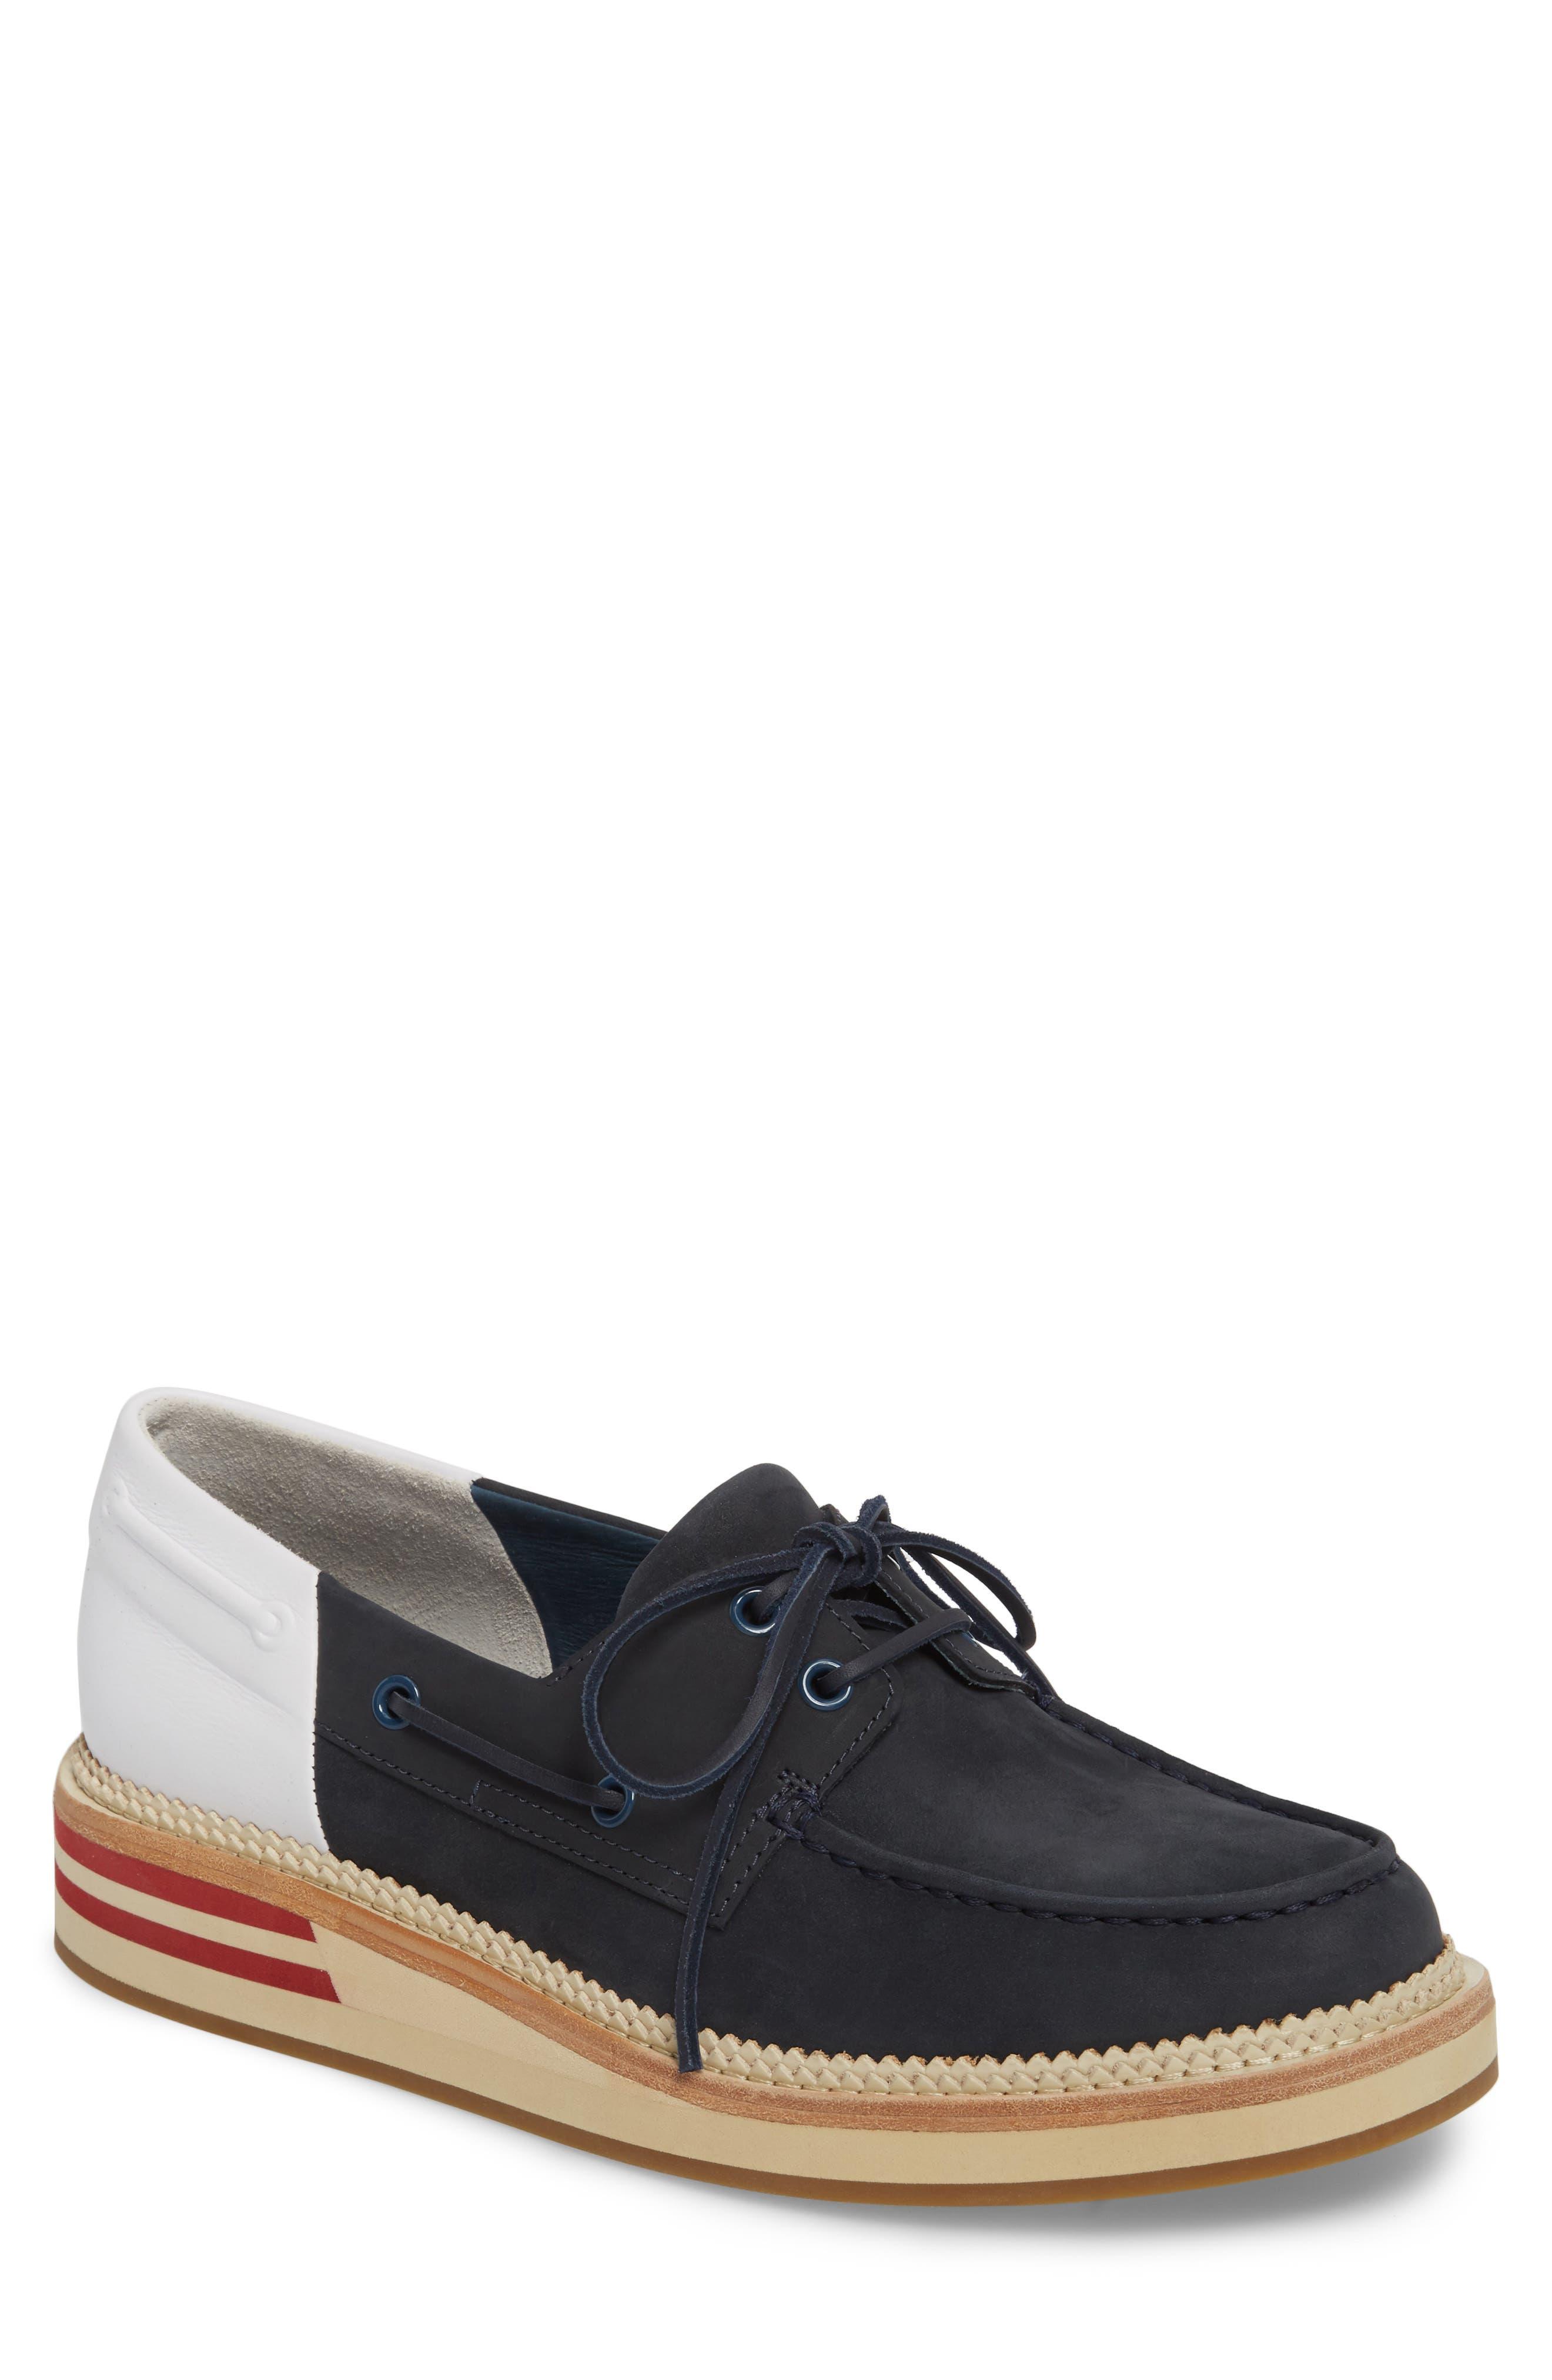 Sperry Cloud Colorblocked Boat Shoe (Men)